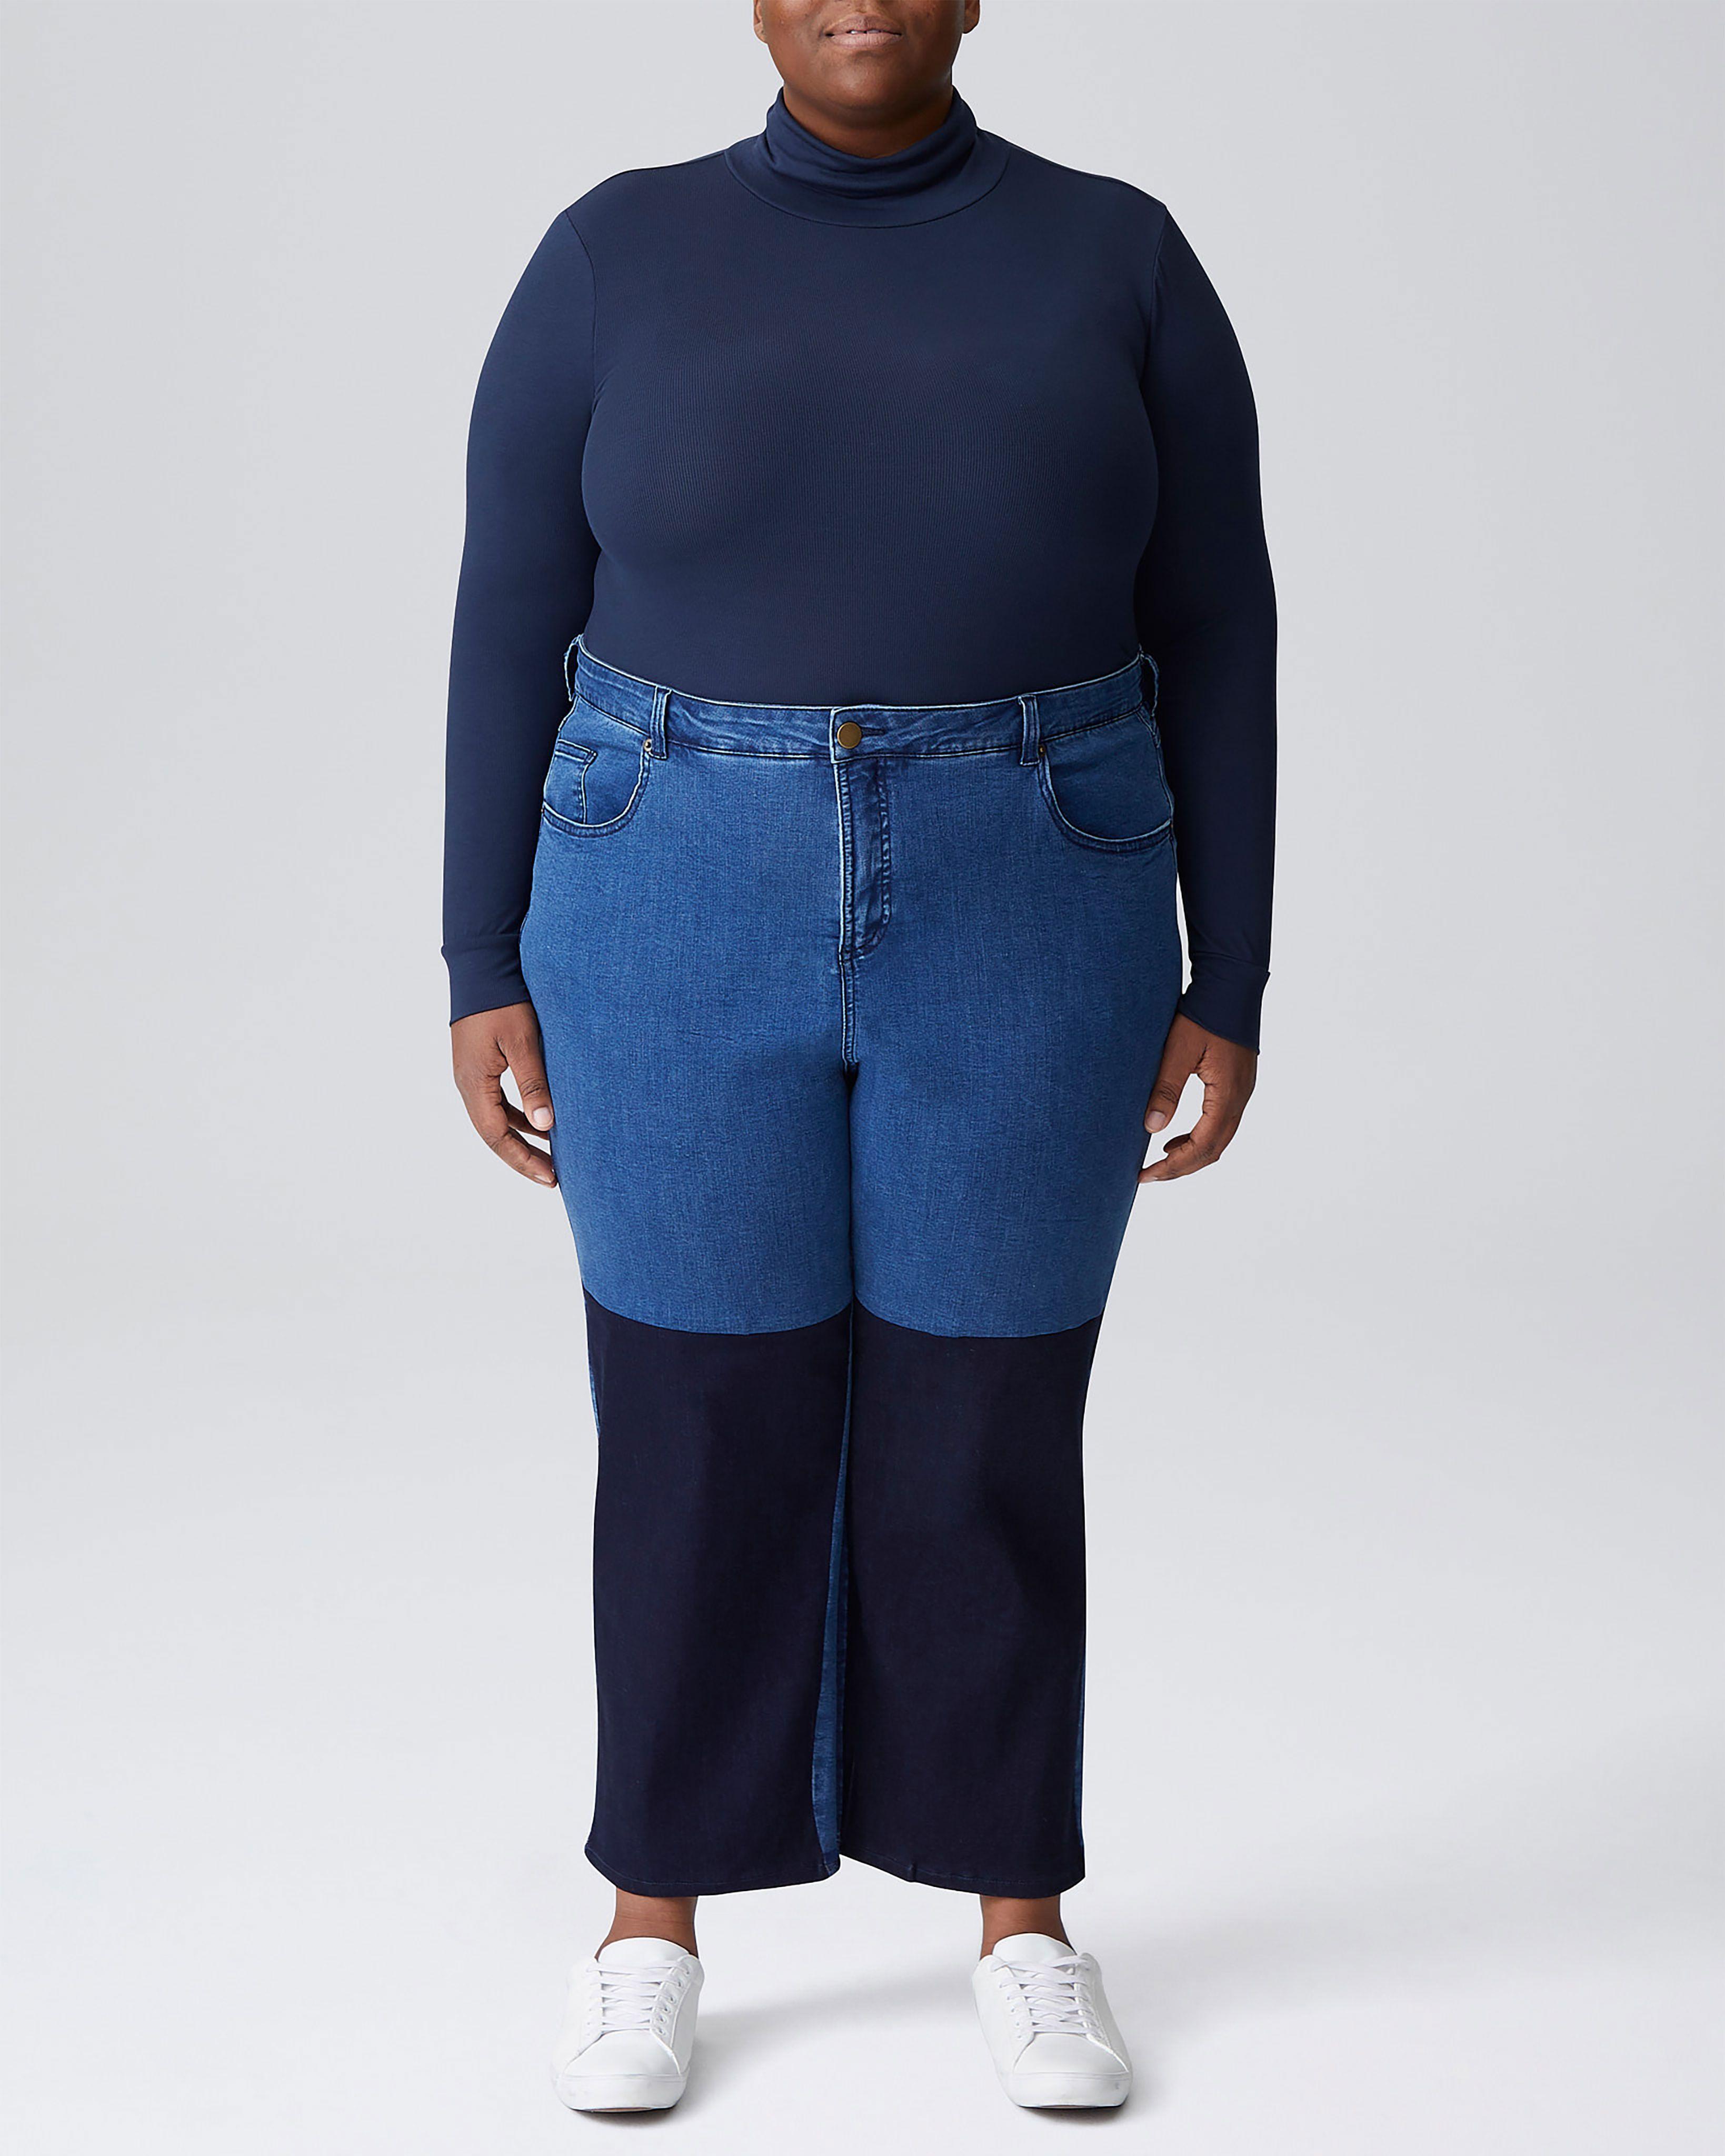 Ravi Colorblock Jeans - Dark Indigo/Blue